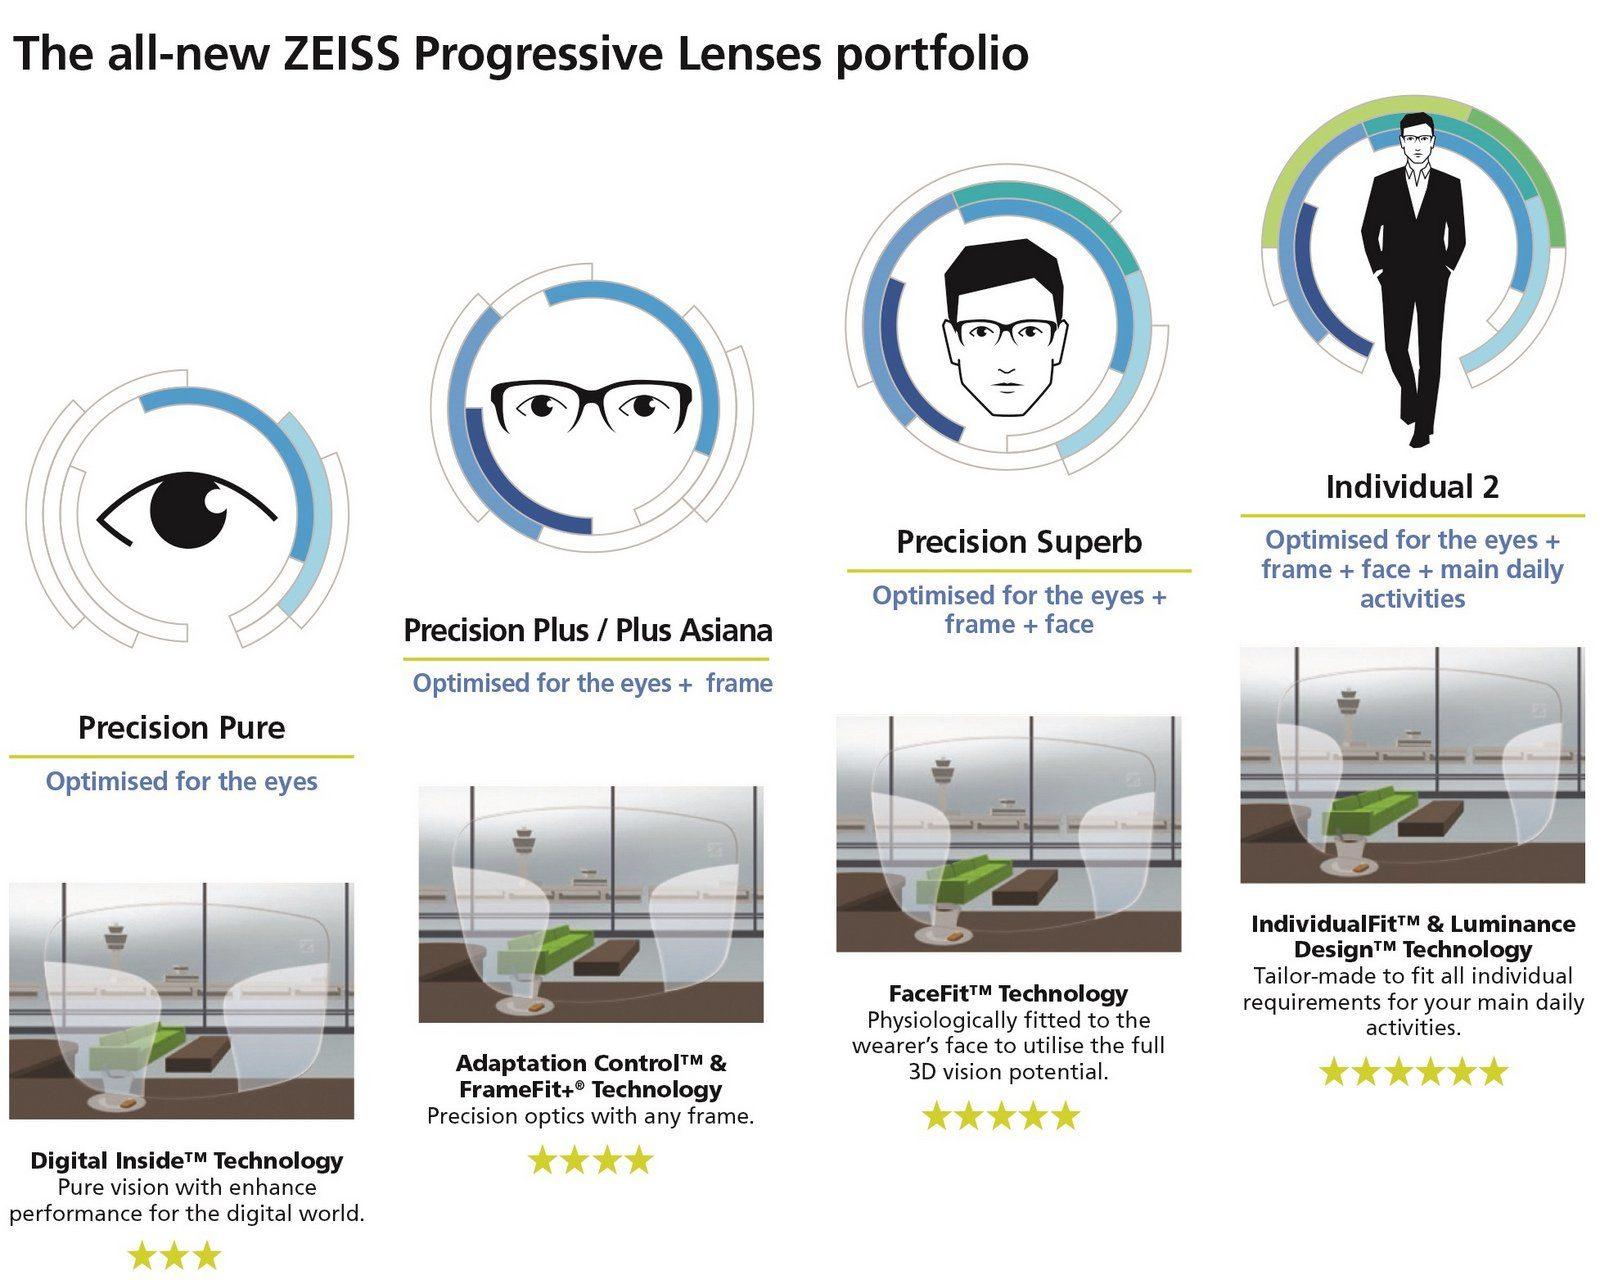 zeiss precision lens portfolio evershineoptical